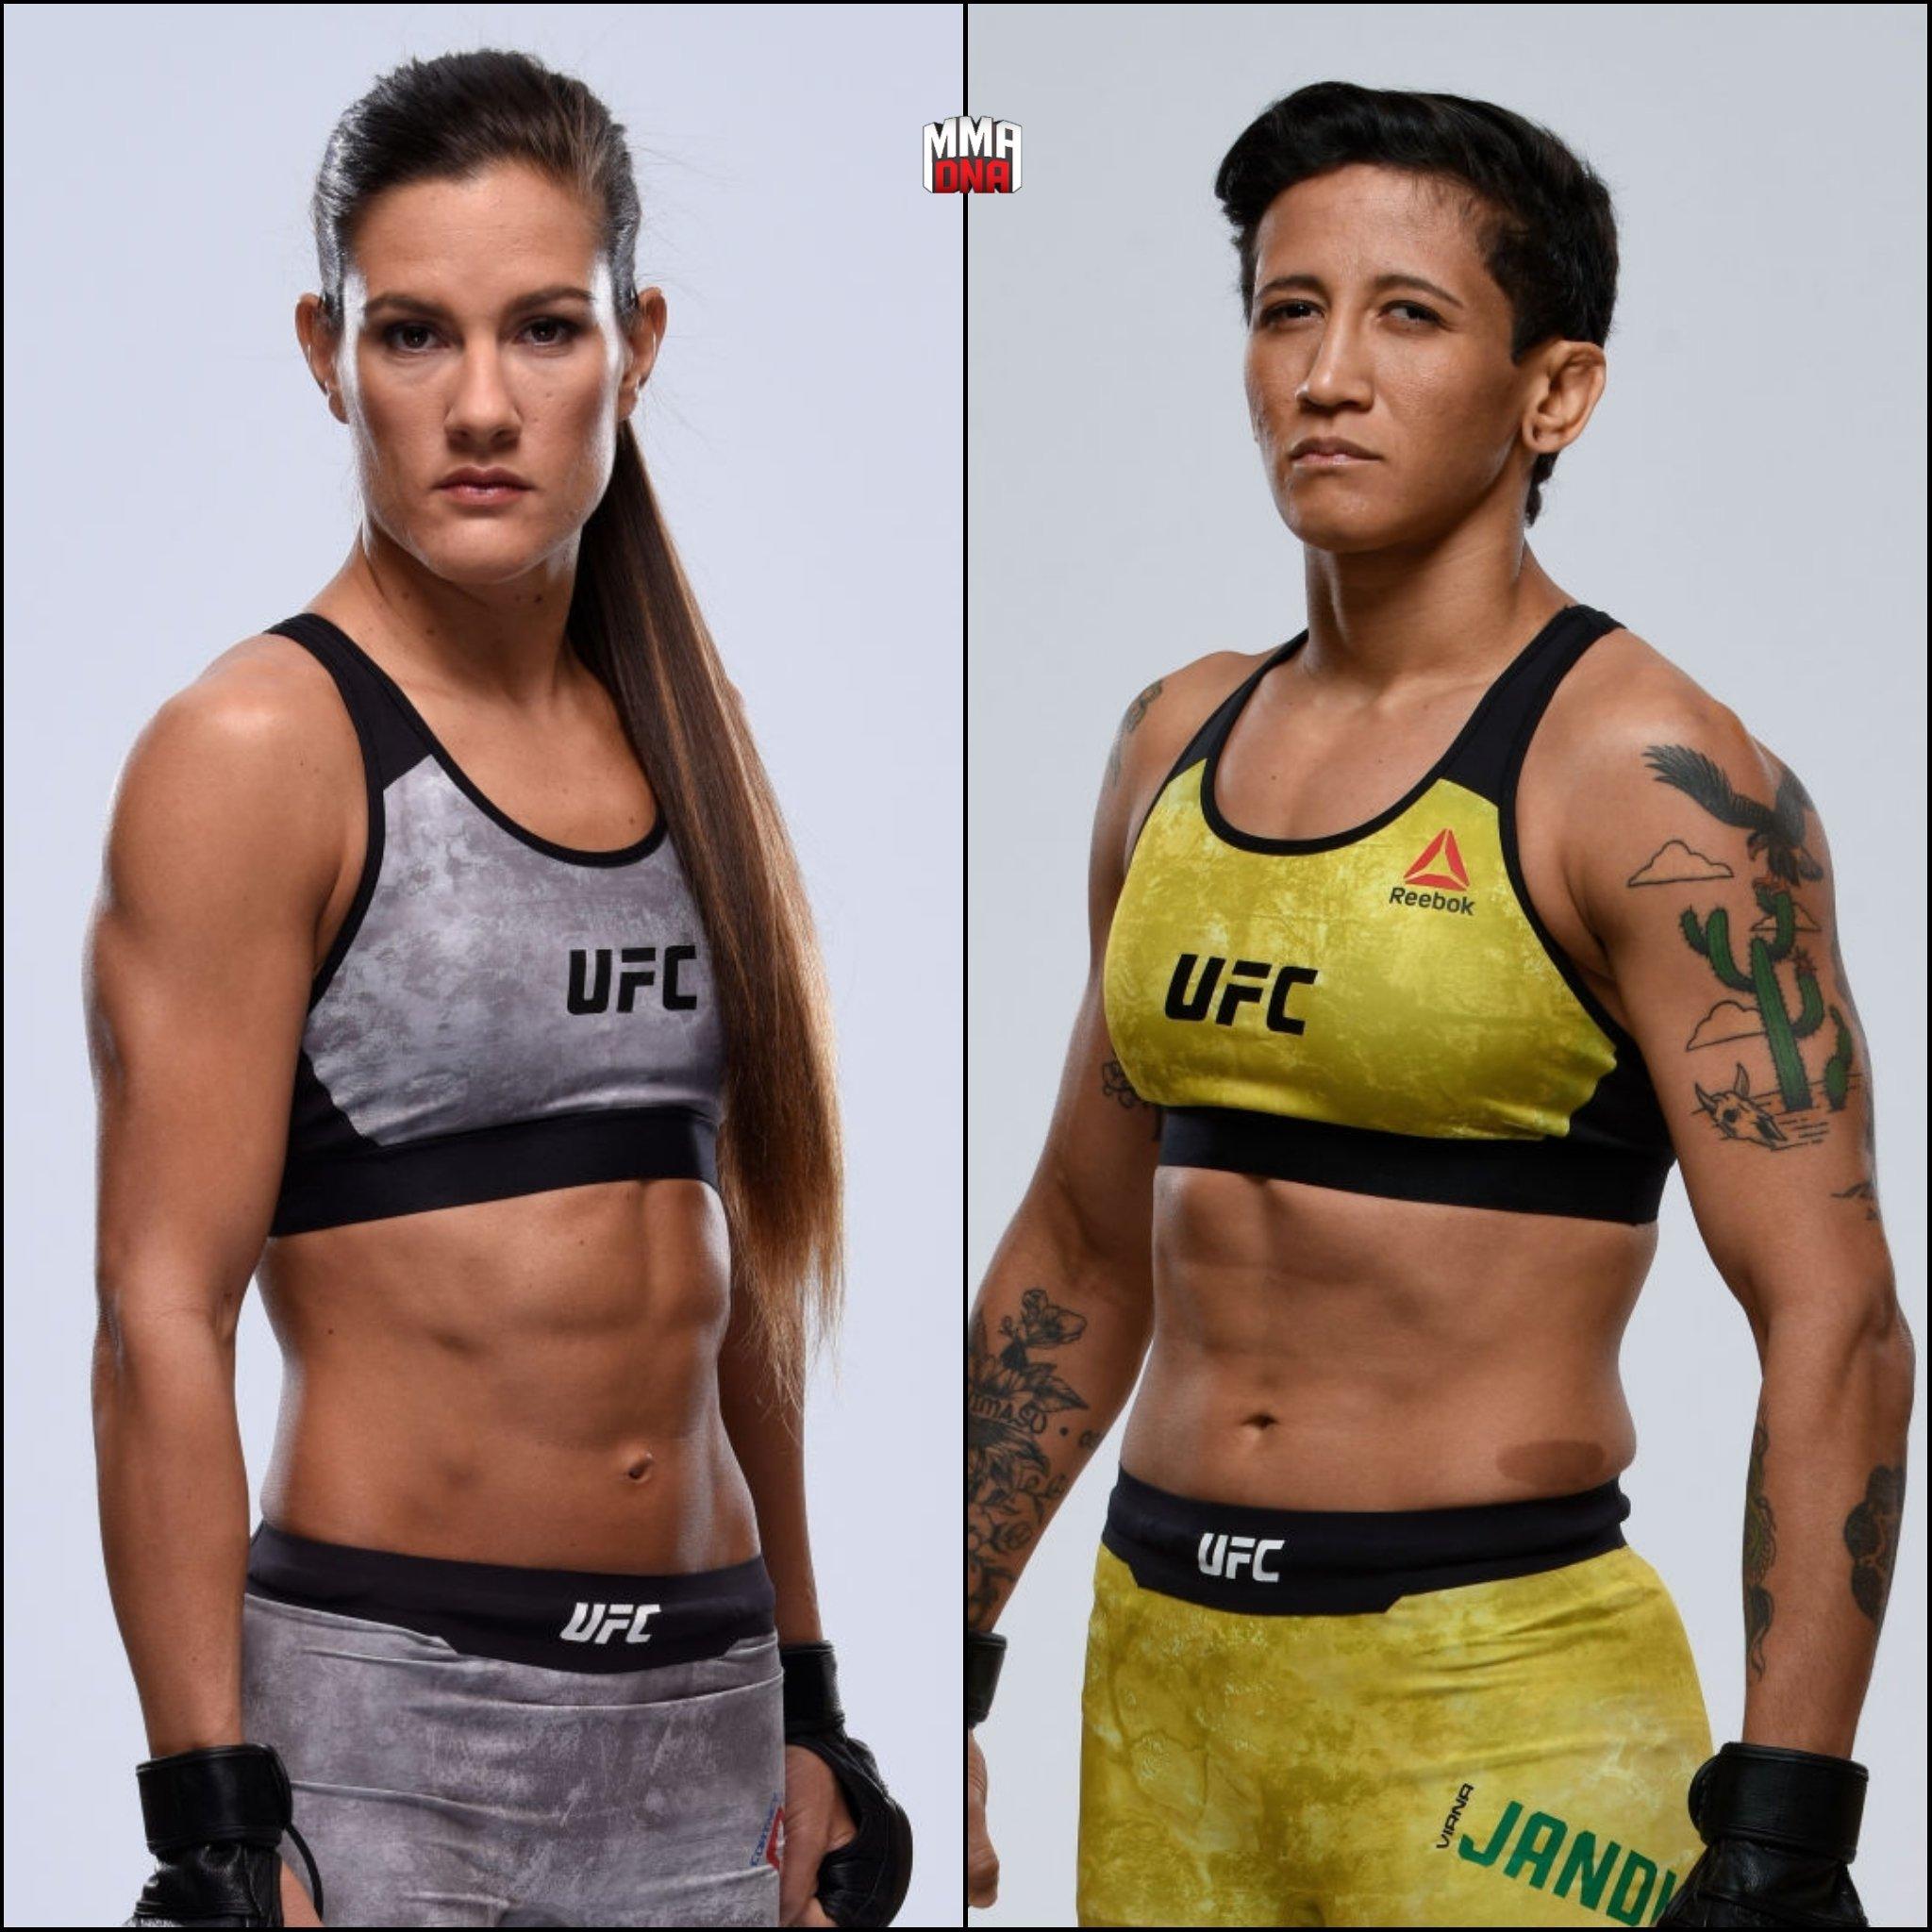 Cortney Casey will fight Virna Jandiroba at #UFConESPN7 in Washington D.C. (Dec. 7, 2019). (per @washingtonpost) #UFC #UFCWashington #MMA #UFCESPN #WMMA https://t.co/graI1awcVh